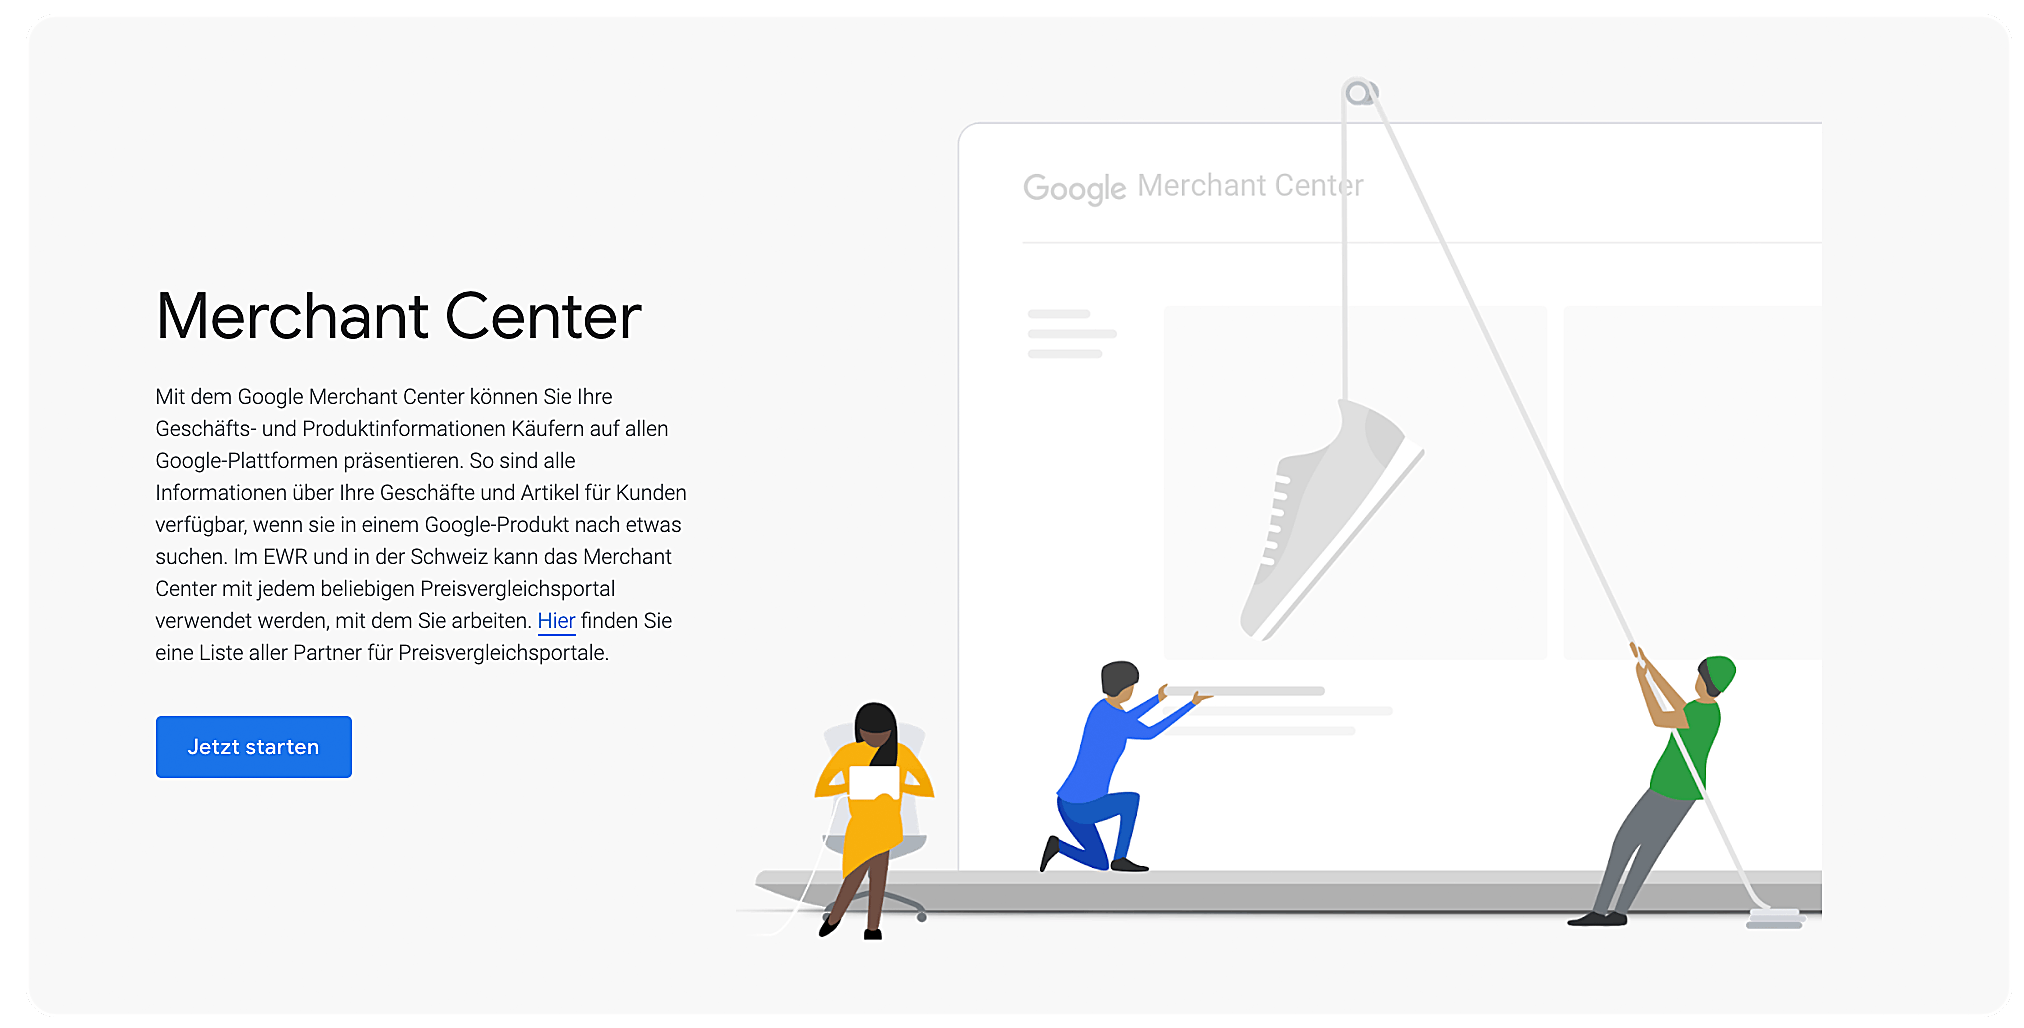 merchant center infos